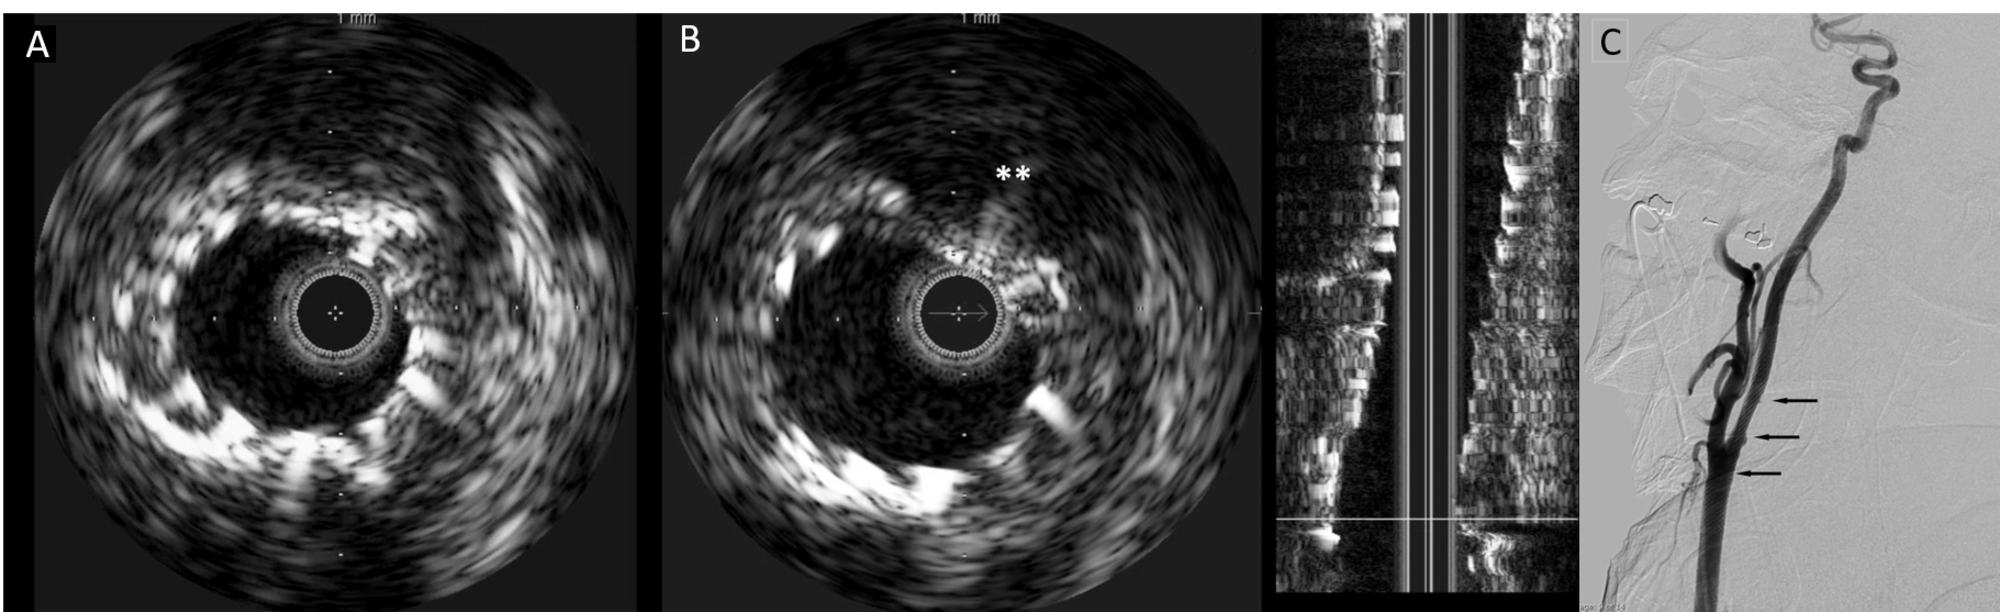 Intravascular-ultrasound-and-digital-subtraction-carotid-angiogram-of-Case-1